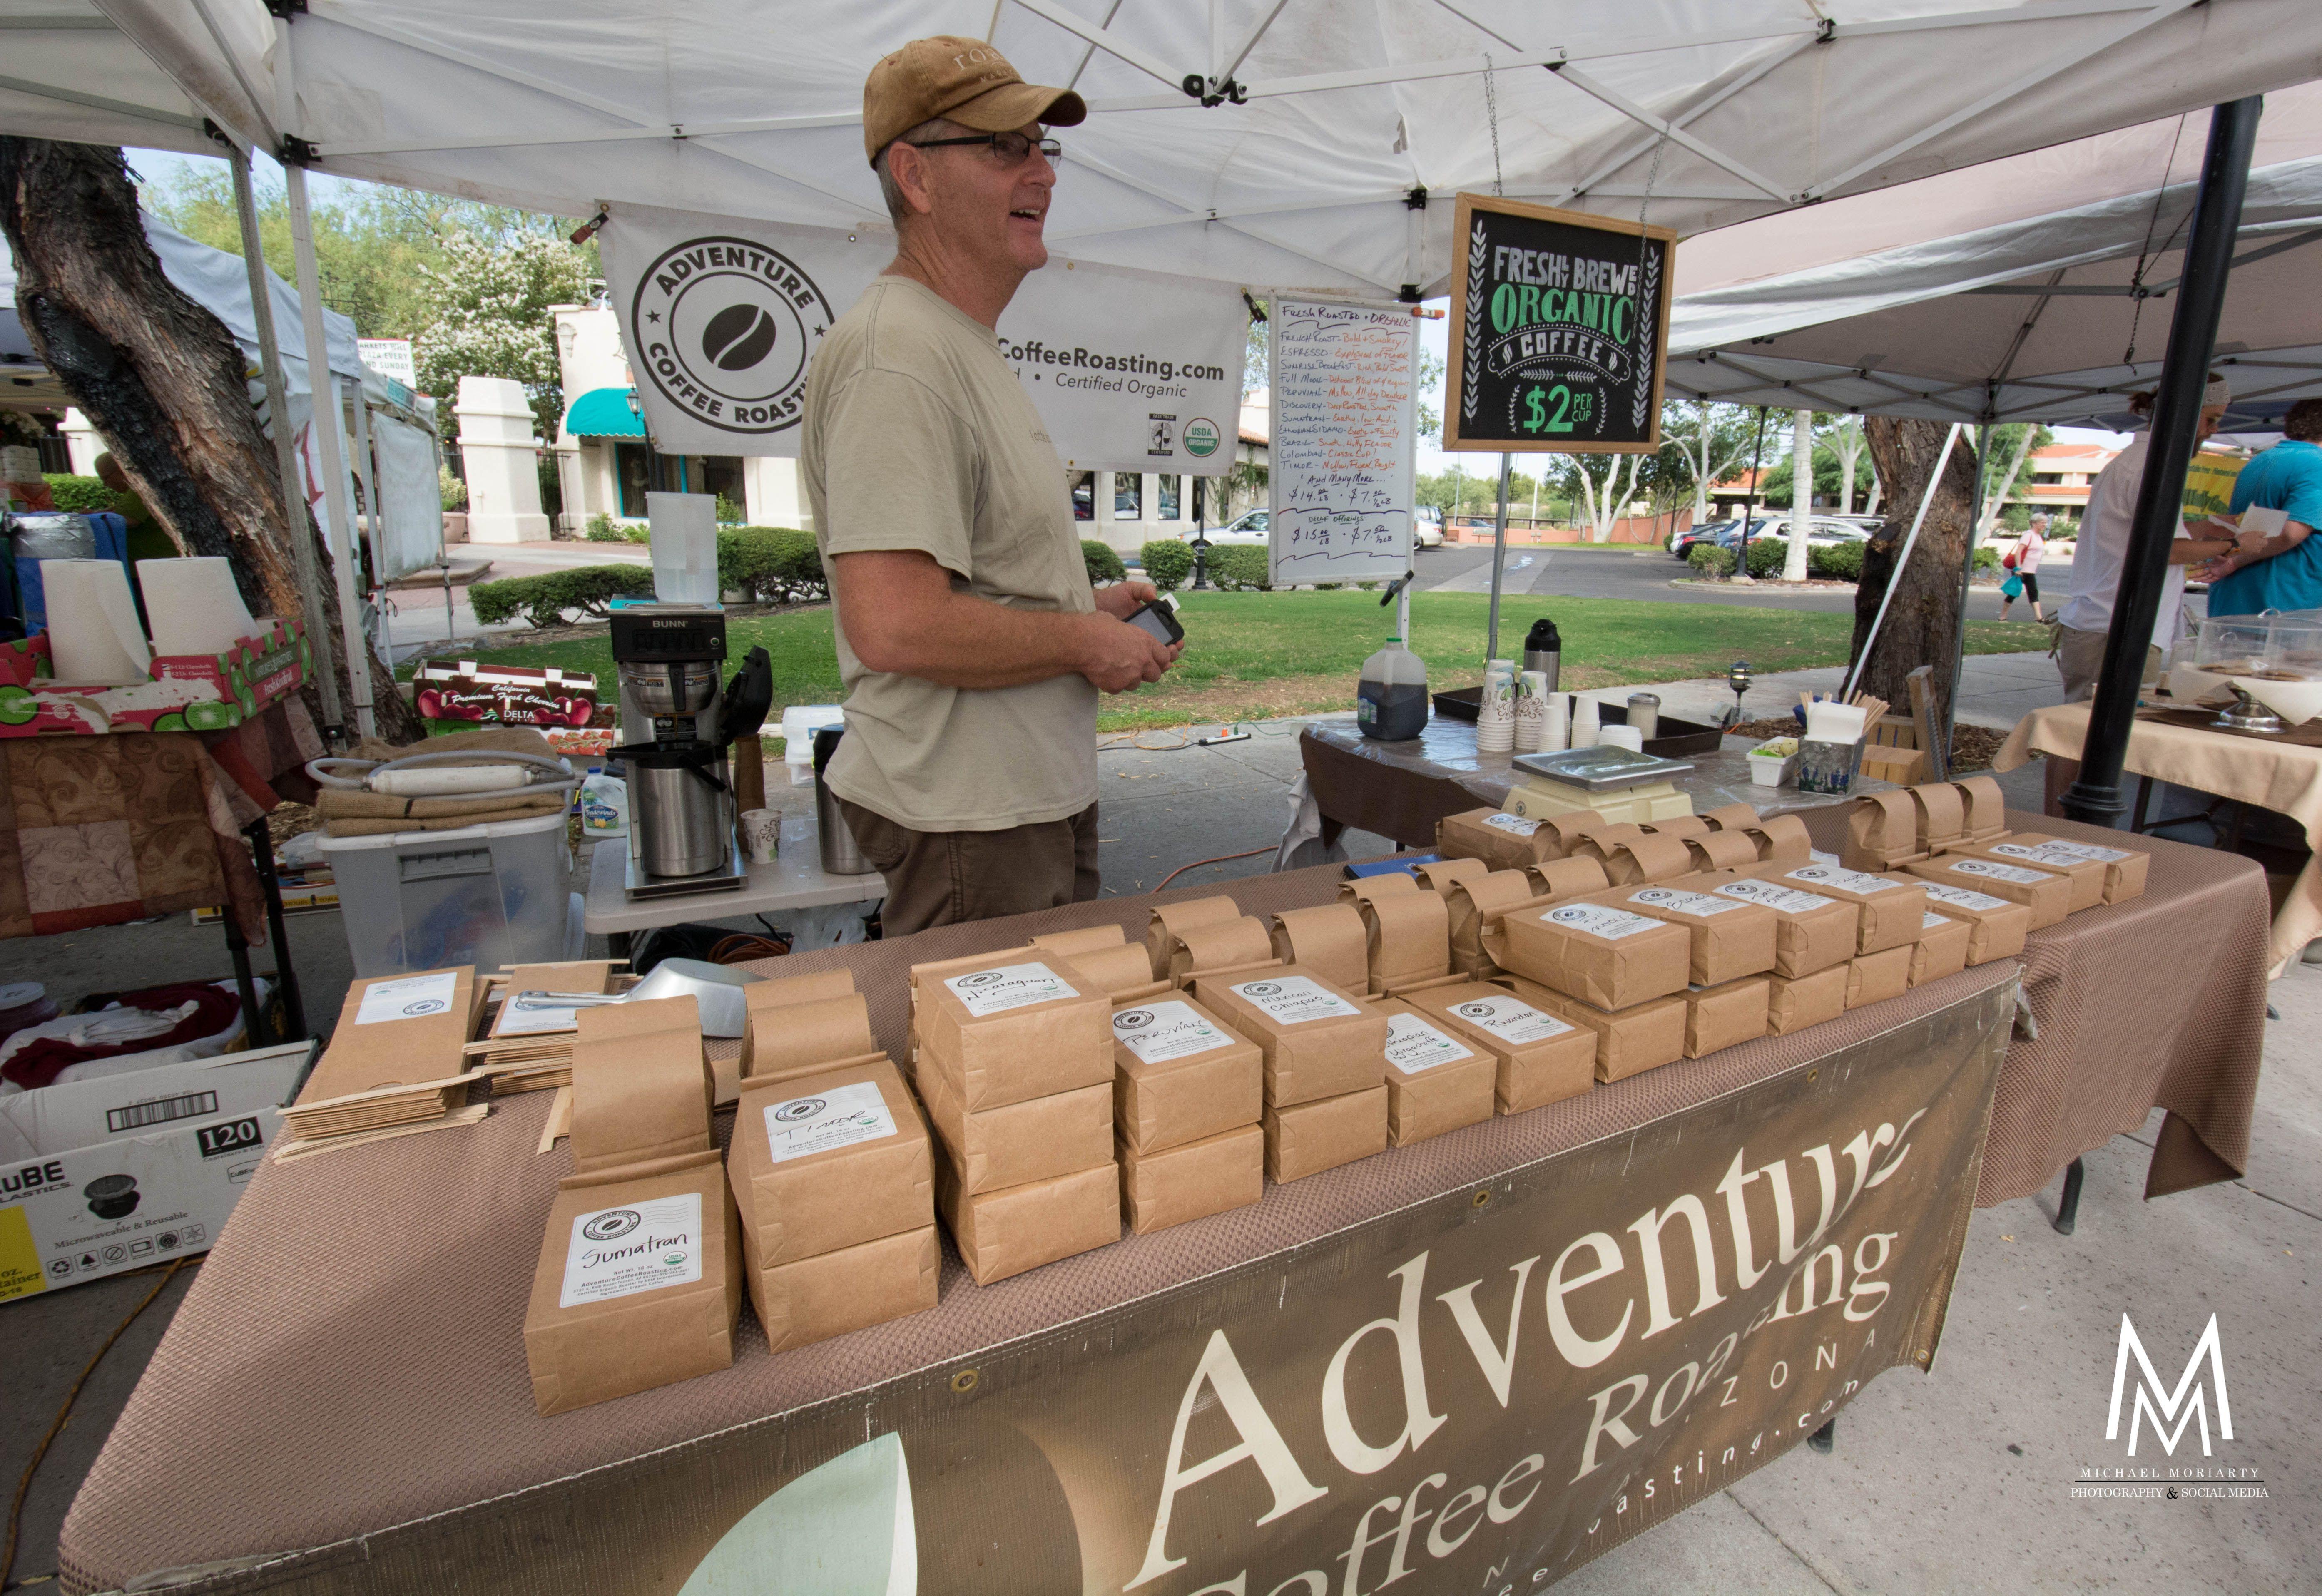 Adventure roaster coffee st philips plaza farmers market